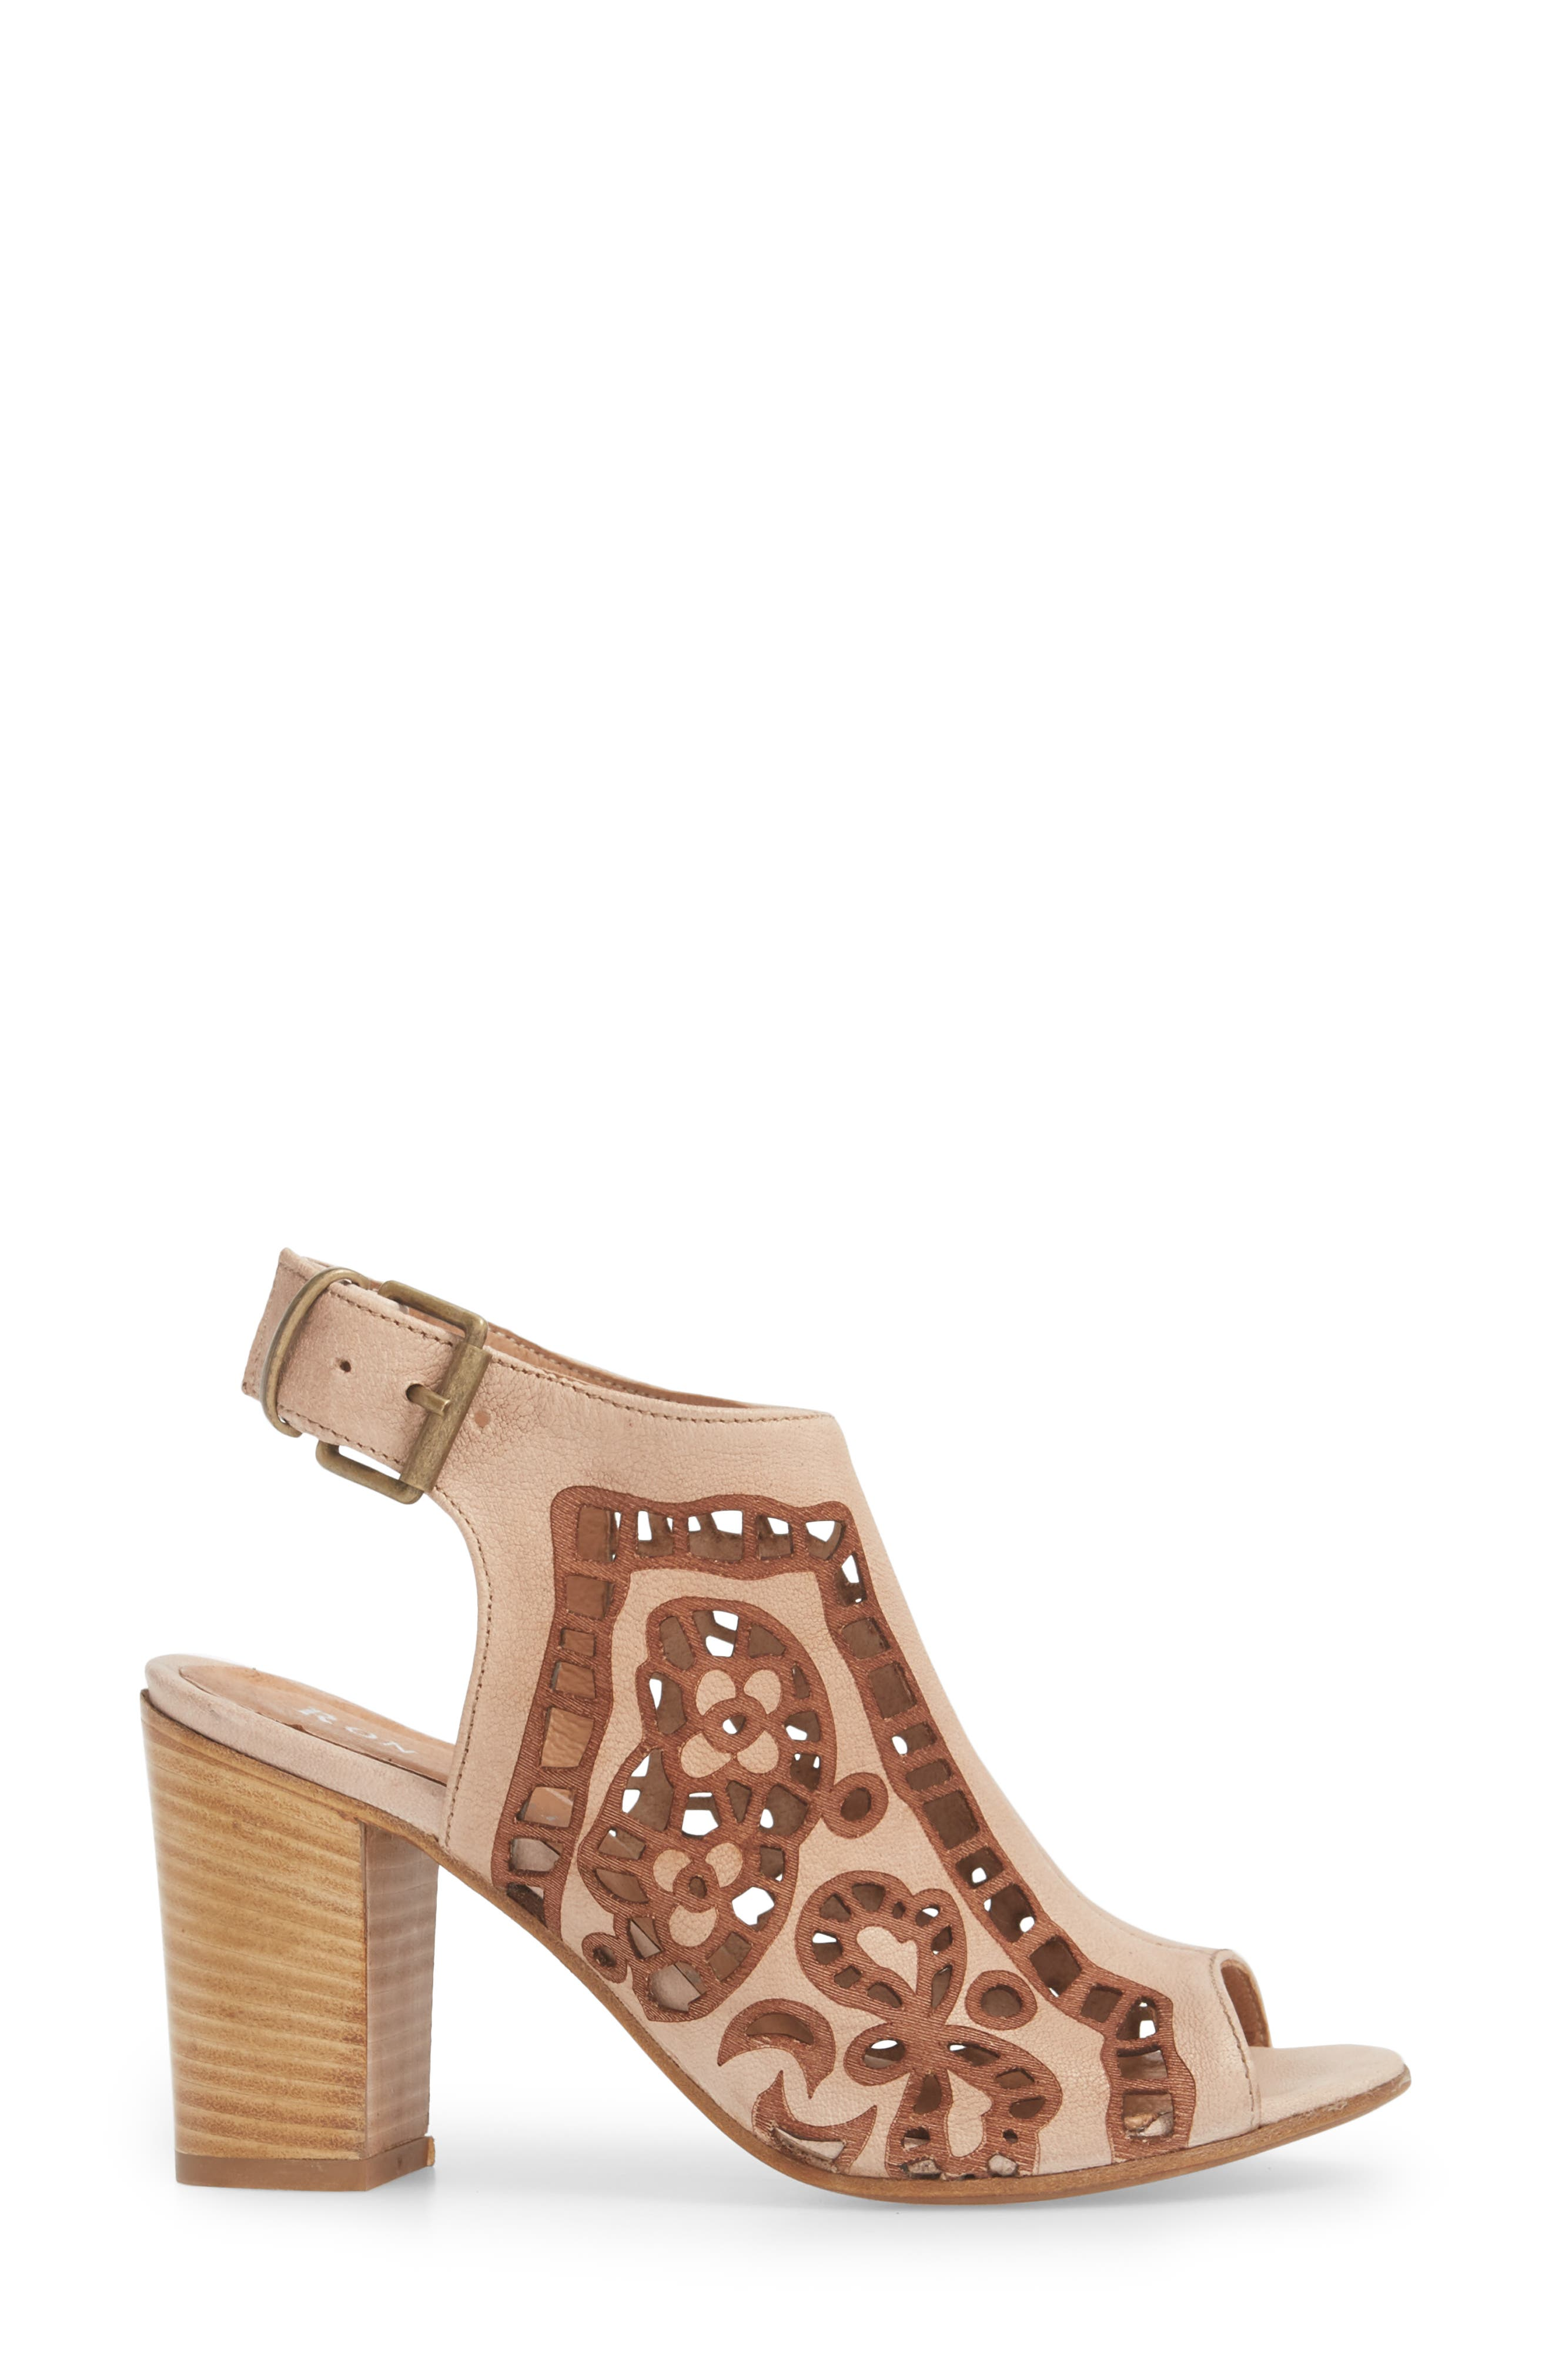 Sabrina Floral Cutout Shield Sandal,                             Alternate thumbnail 3, color,                             Blush Leather